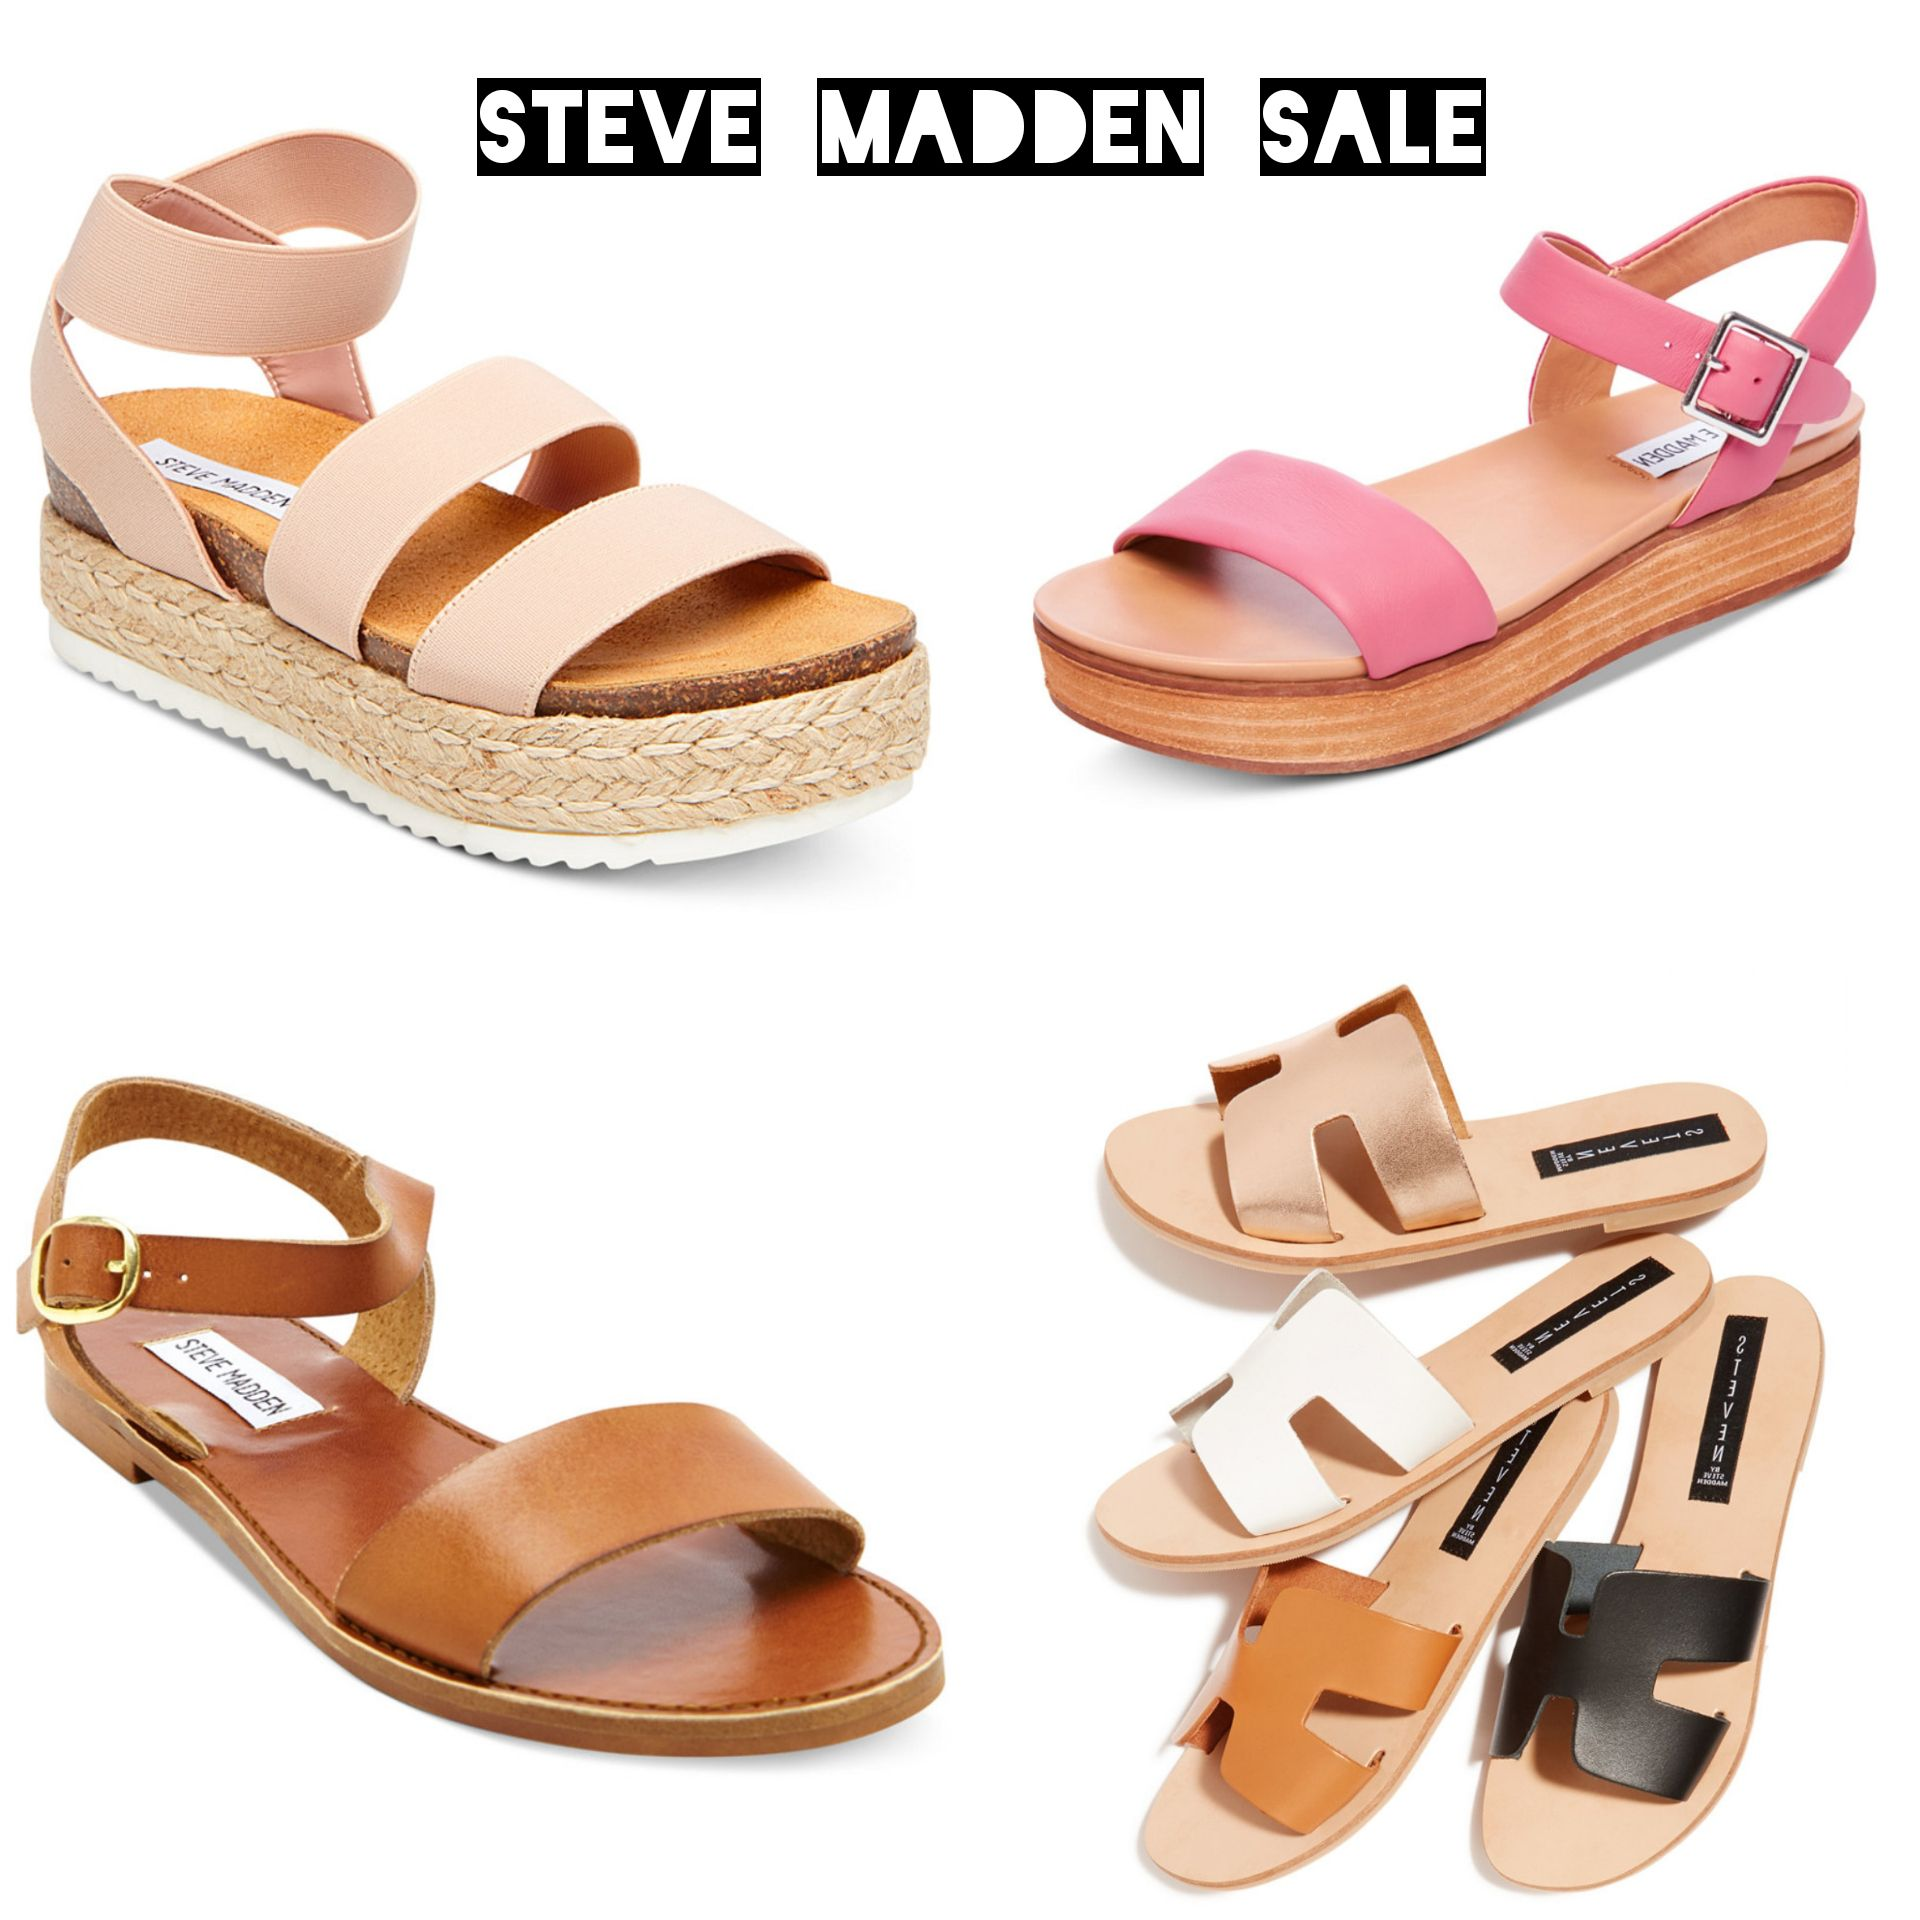 d54cd1154433 Steve Madden SPRING sandals on SALE! - Macys Style Crew